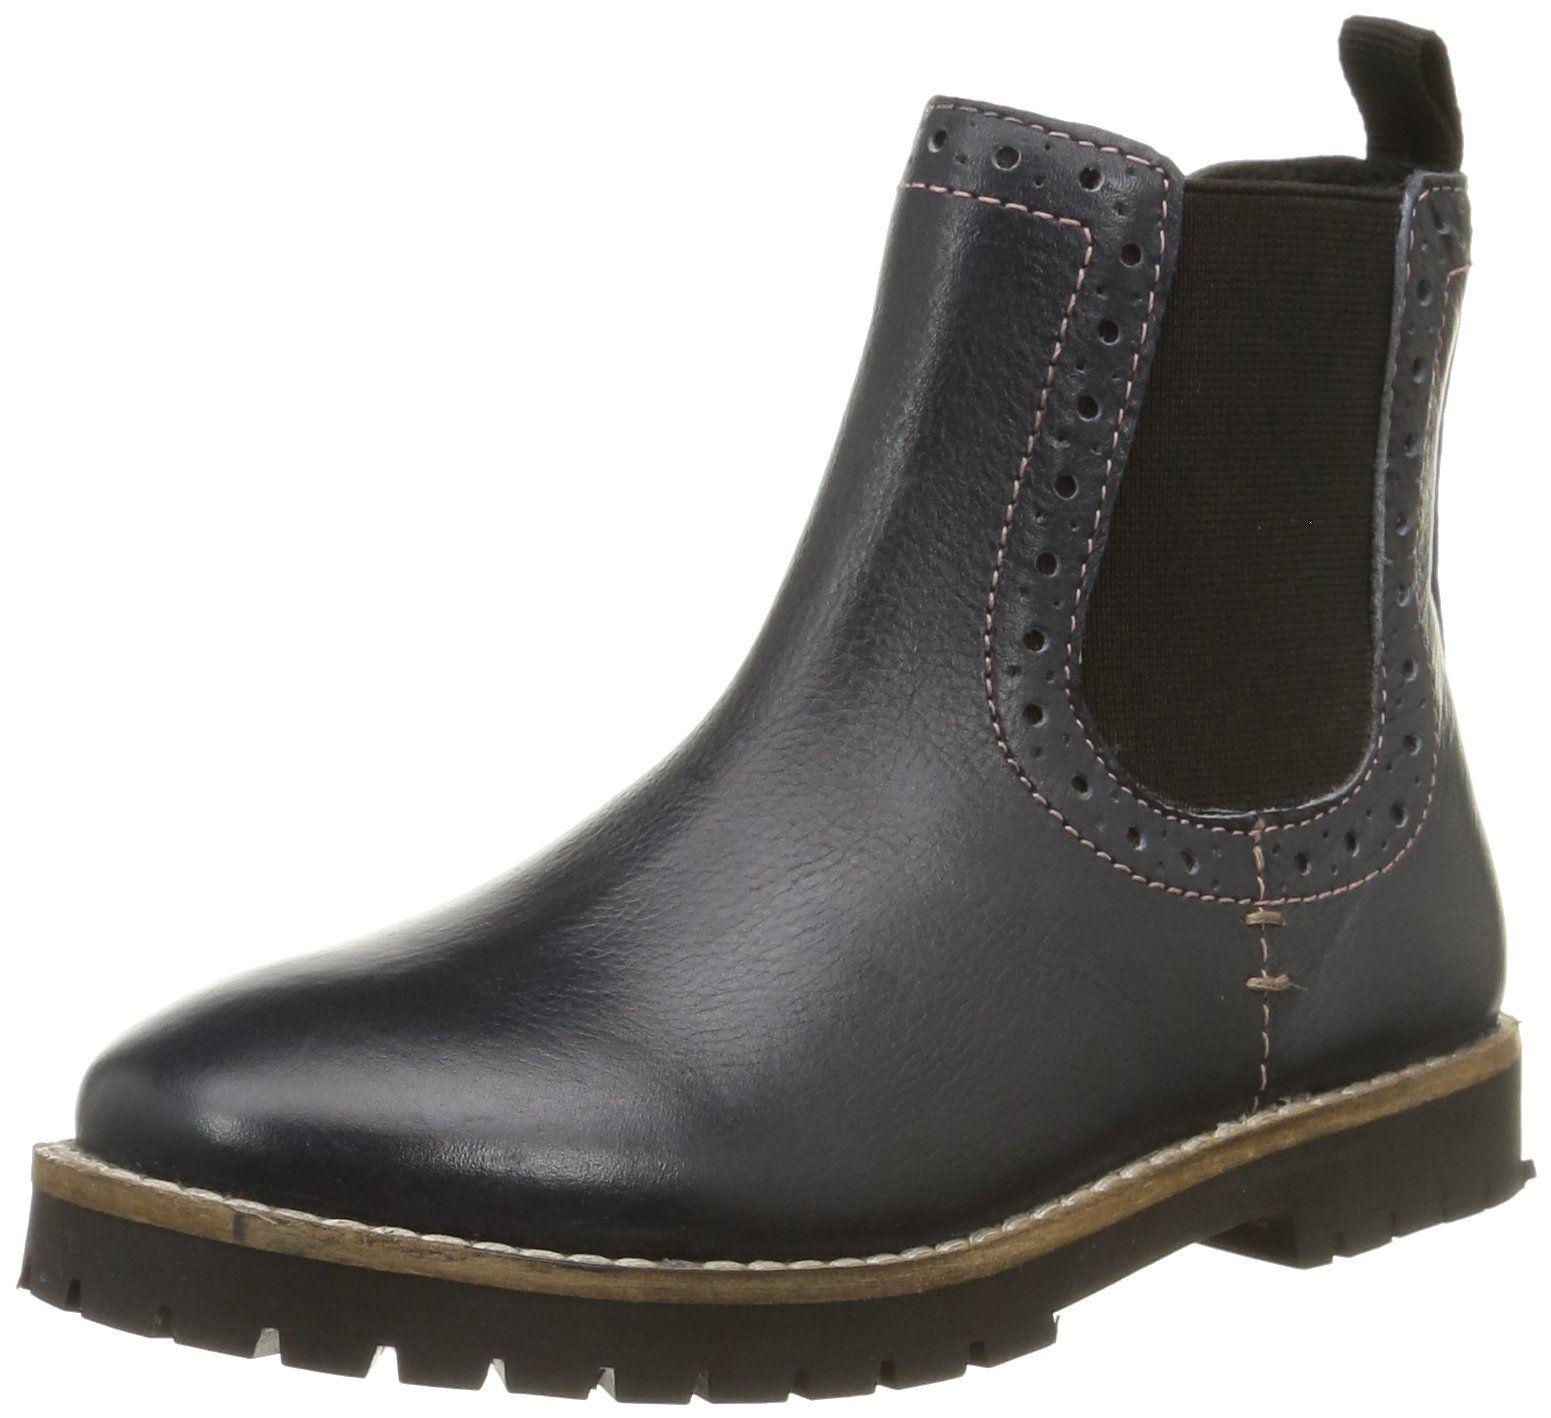 Zapatos negros Bisgaard infantiles fTk2gMuG5